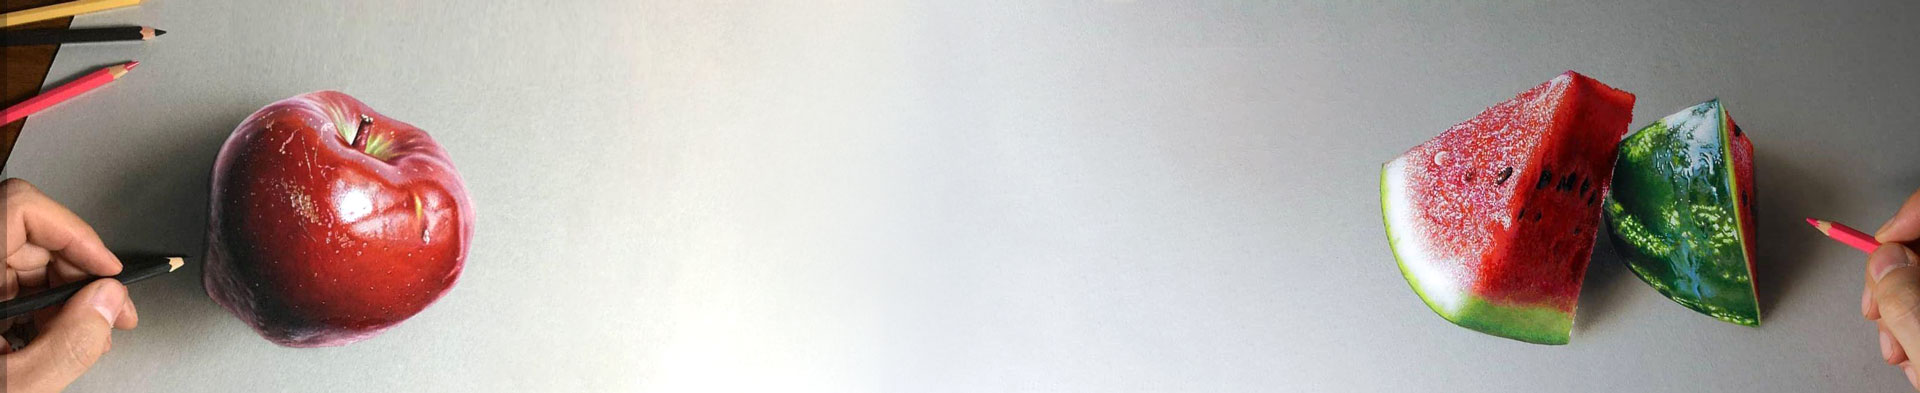 naghashi 3d painting pouyaandish 1 header - نقاشی سه بعدی